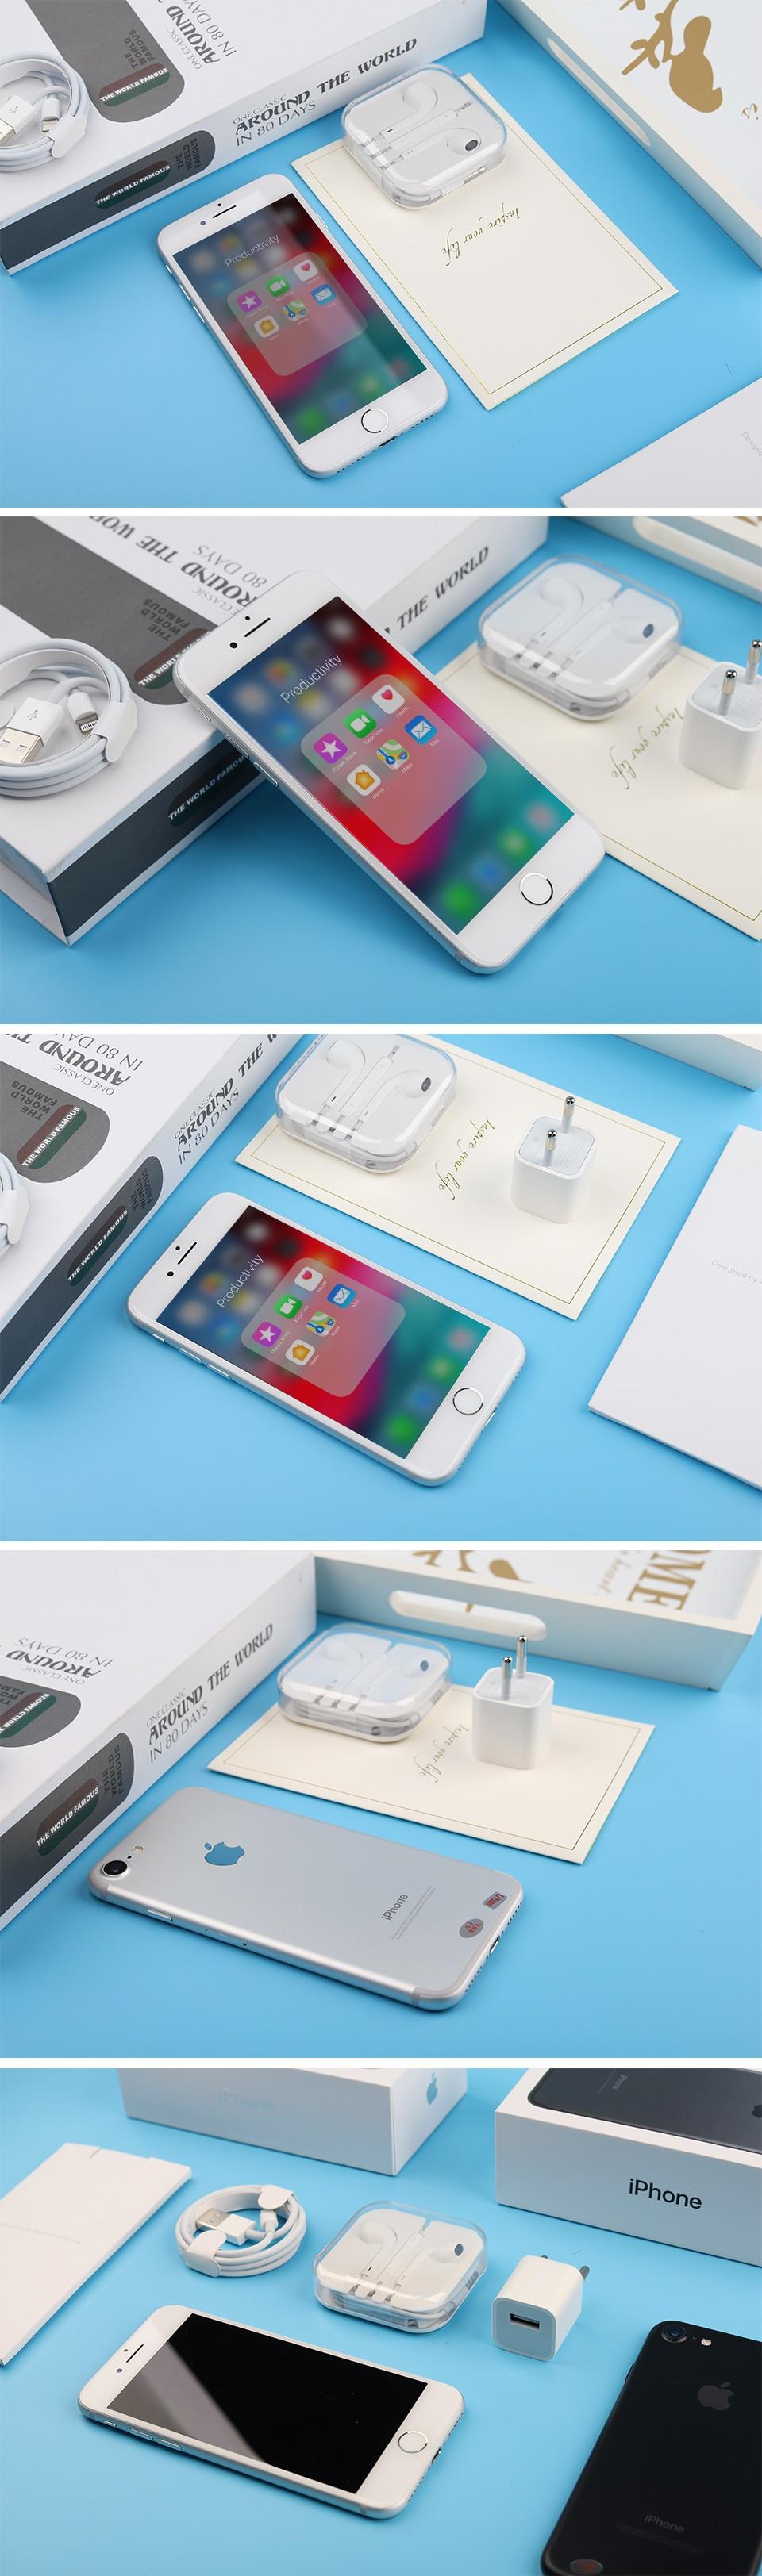 Разблокированный смартфон Apple iPhone 7 4G LTE 4,7 дюймов Apple A10 IOS 12,0 МП камера отпечатков пальцев 32 ГБ/128 ГБ/256 ГБ rom смартфоны